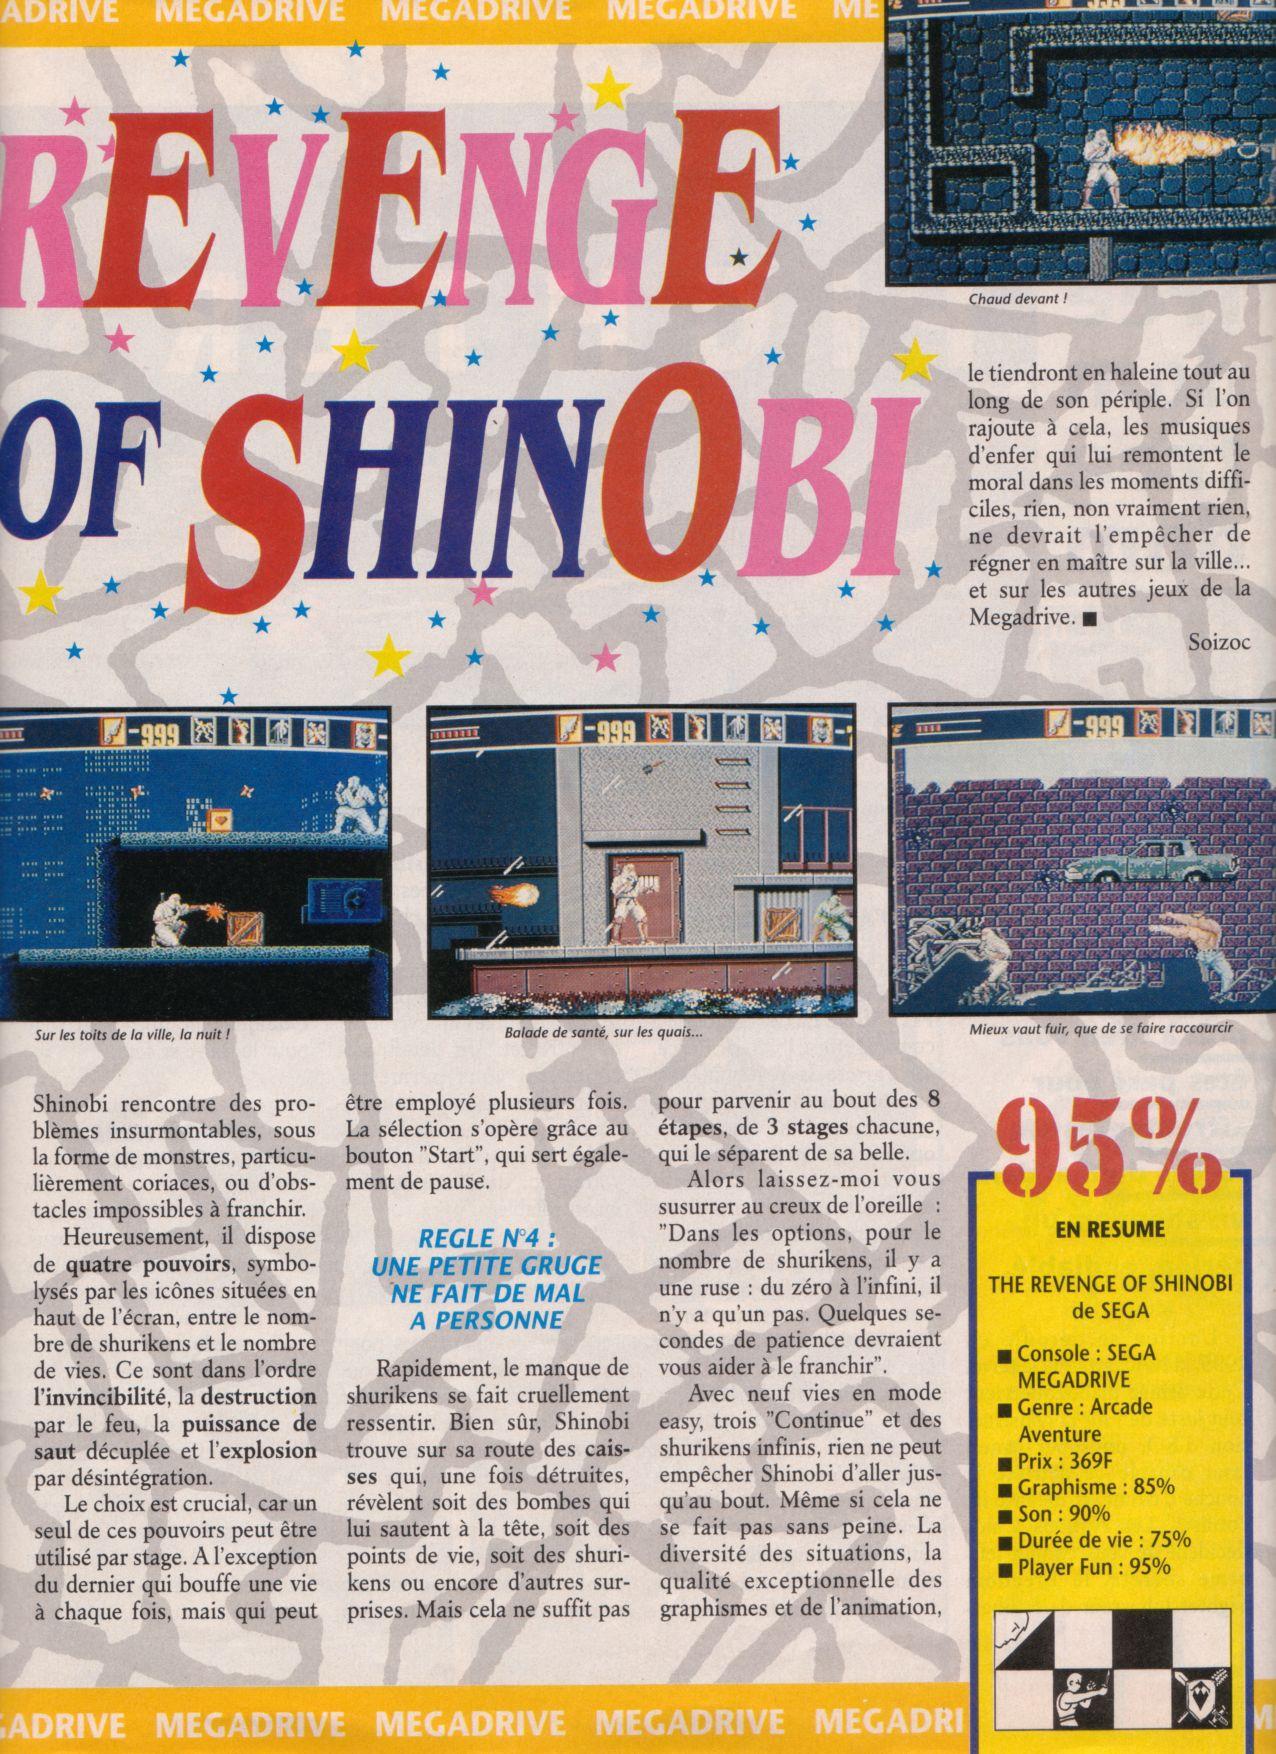 [Jeux]   THE REVENGE OF SHINOBI (Megadrive ) 1989. Player%20One%20002%20-%20Page%20037%20(1990-10)